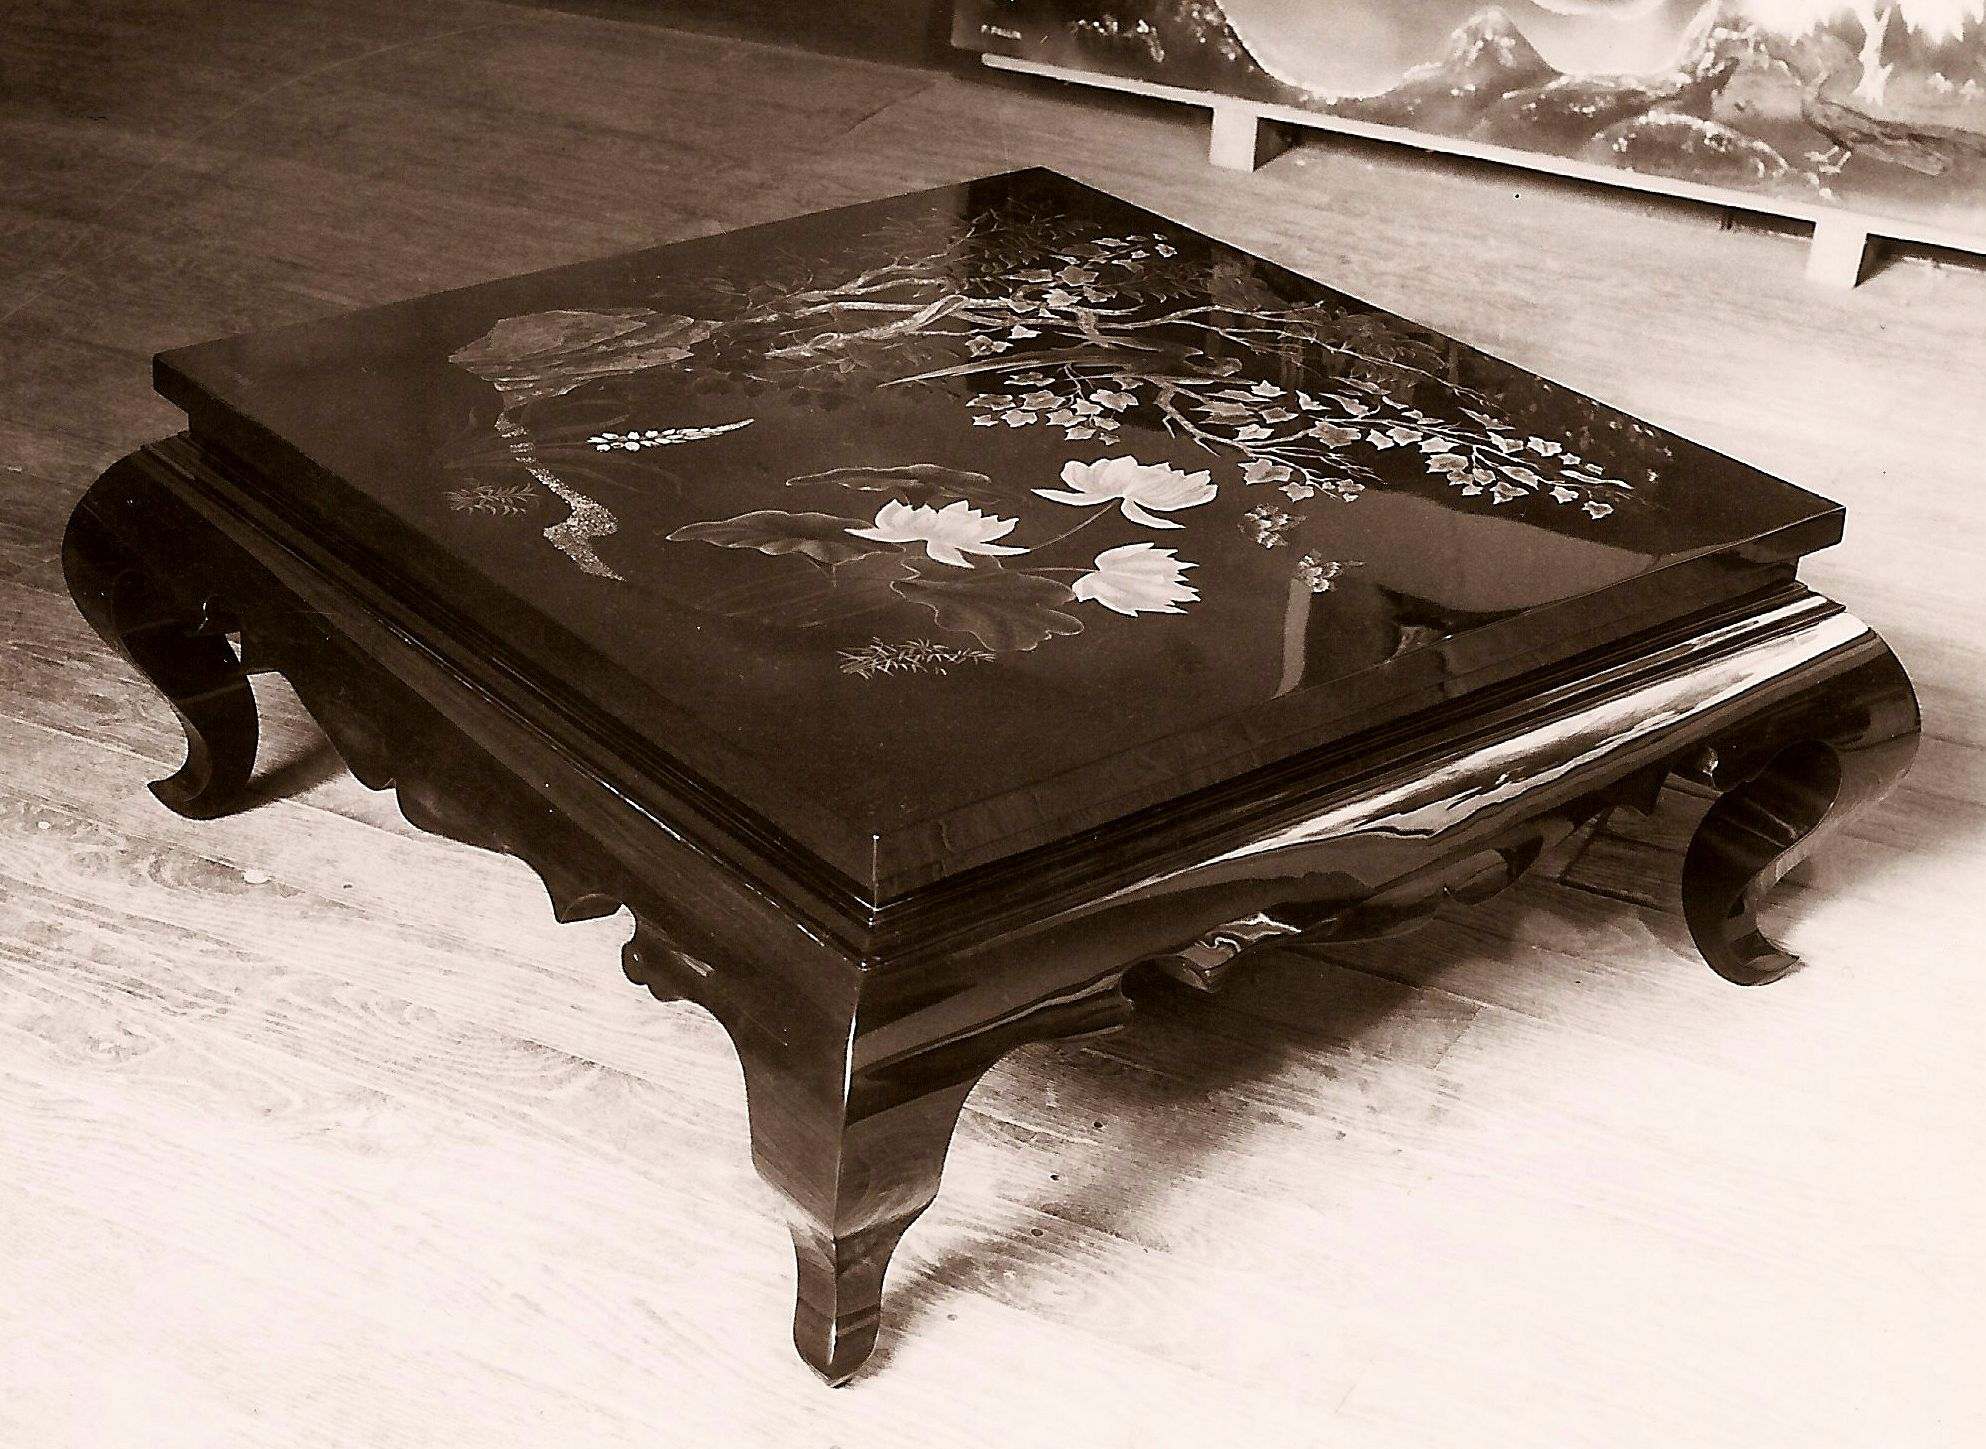 table basse carr e laqu e pierre paulin pierre paulin. Black Bedroom Furniture Sets. Home Design Ideas